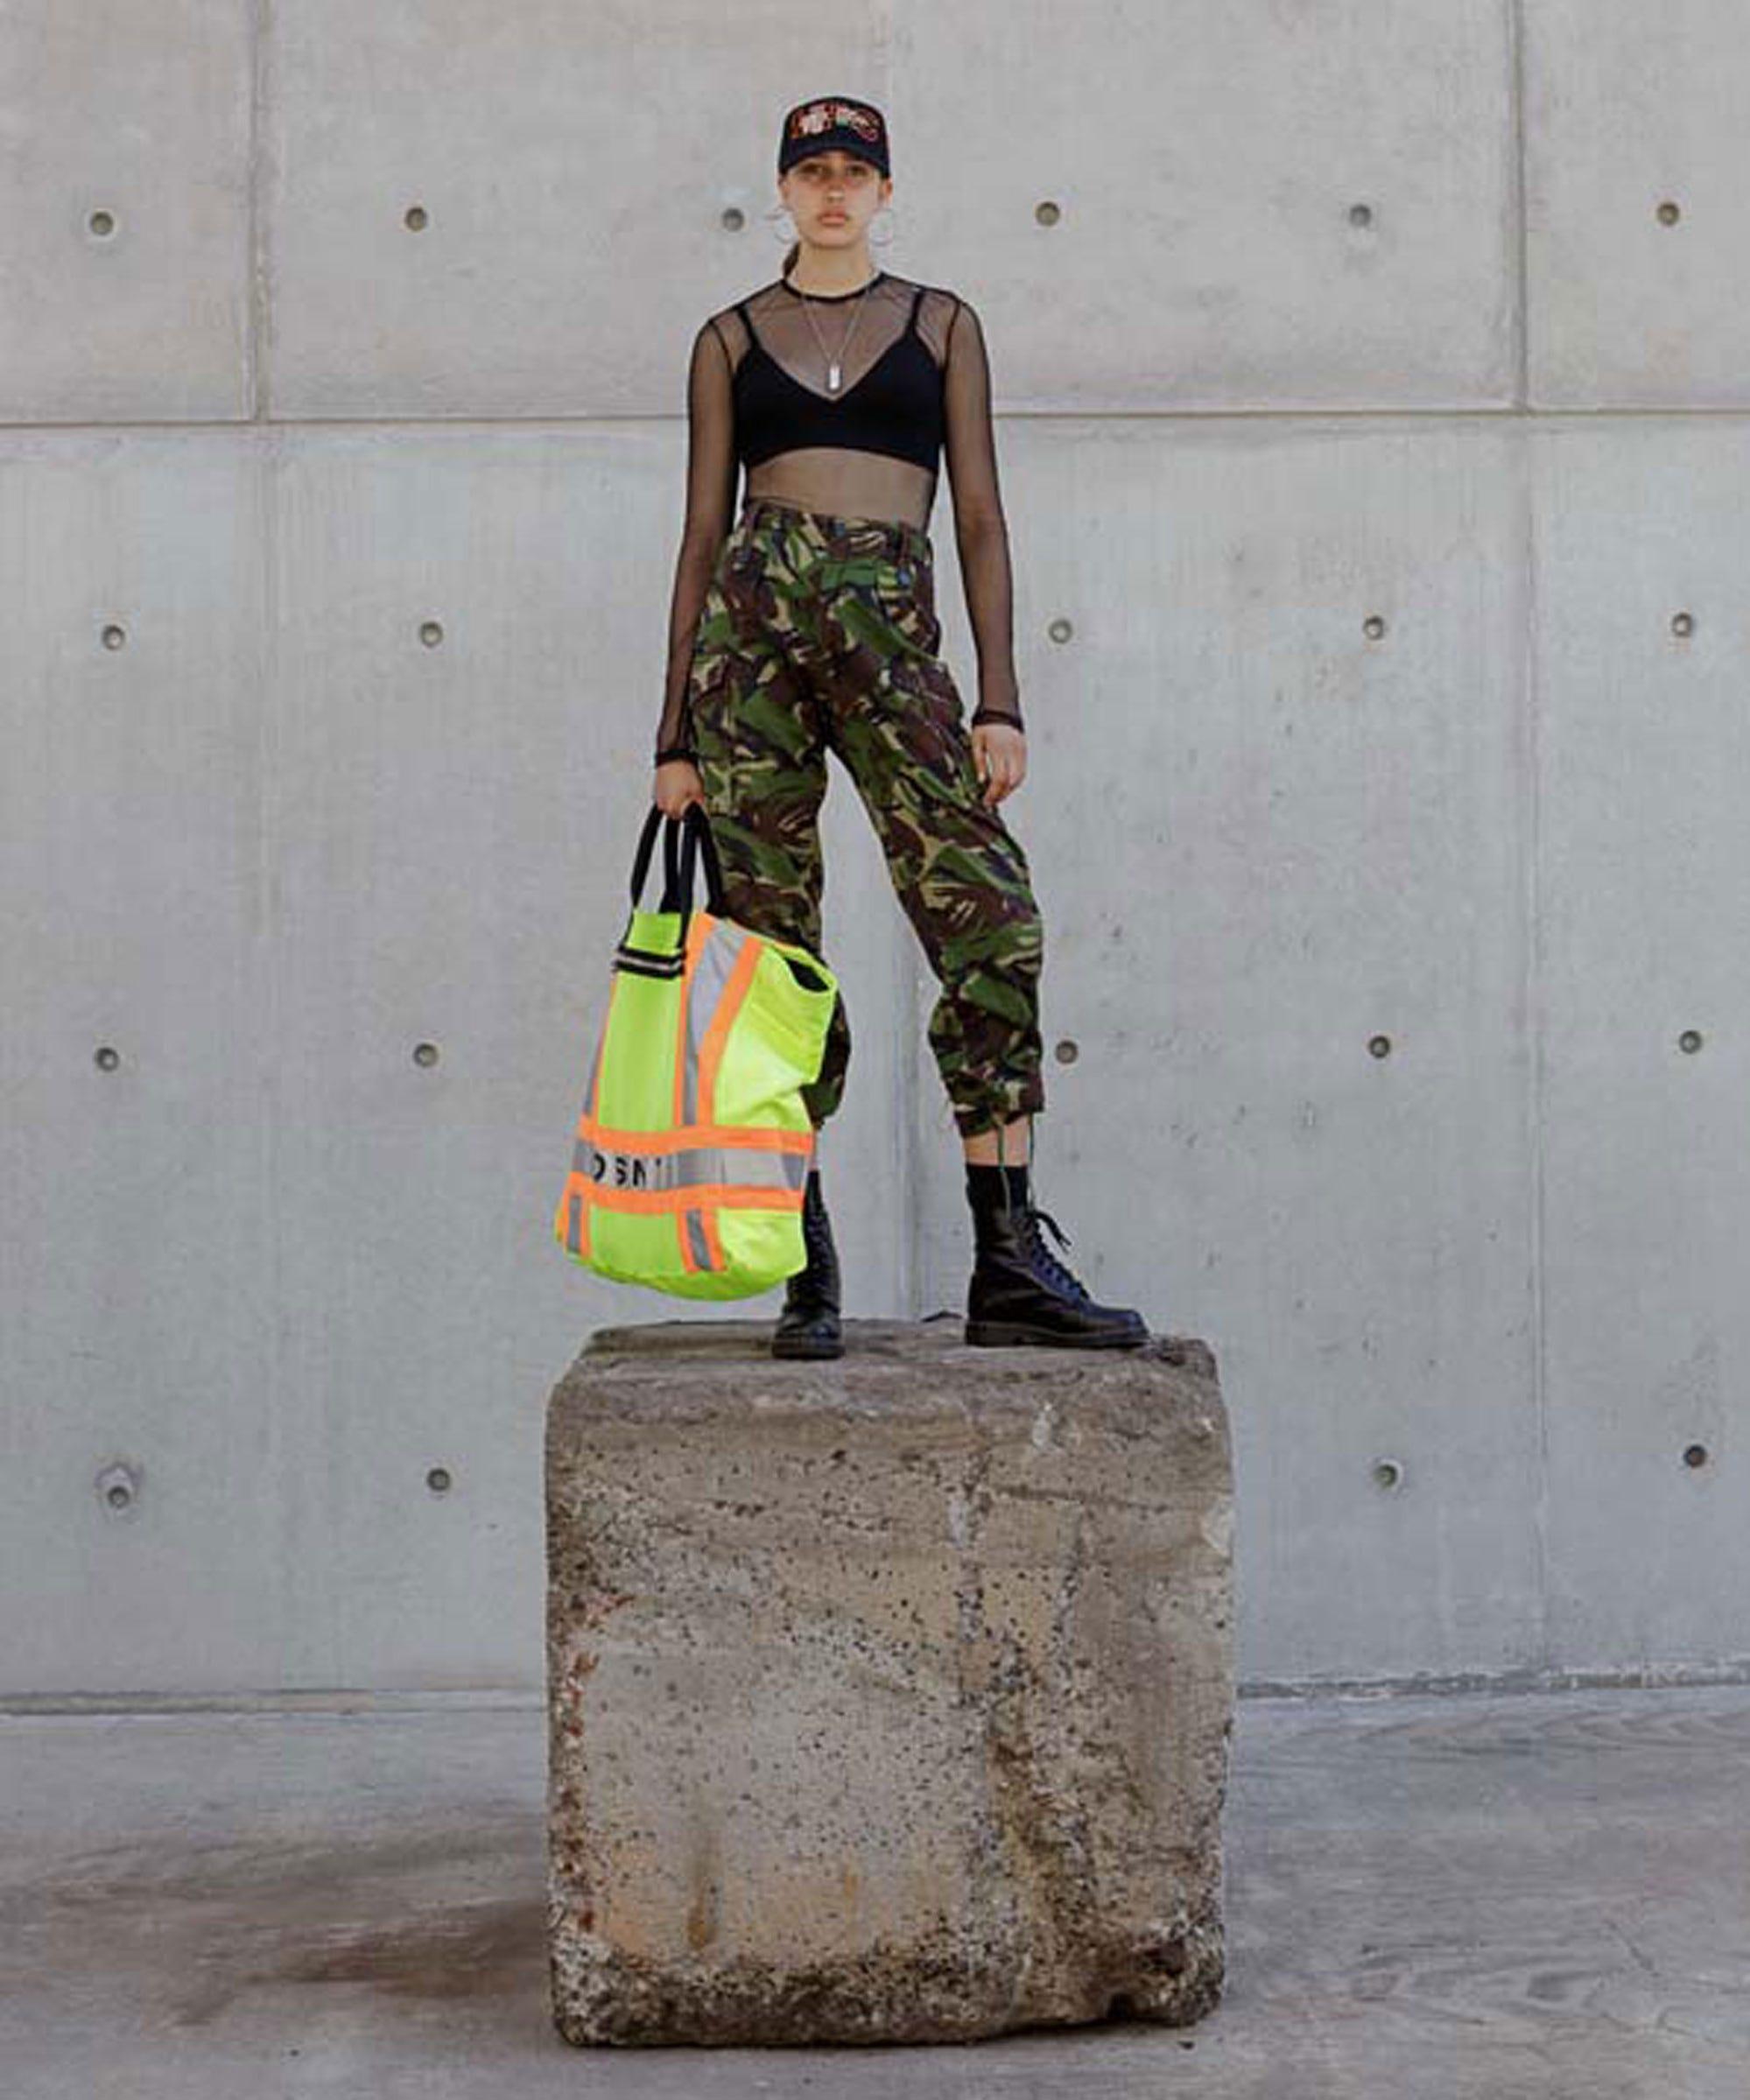 Image result for sanitation garbage fashion new york